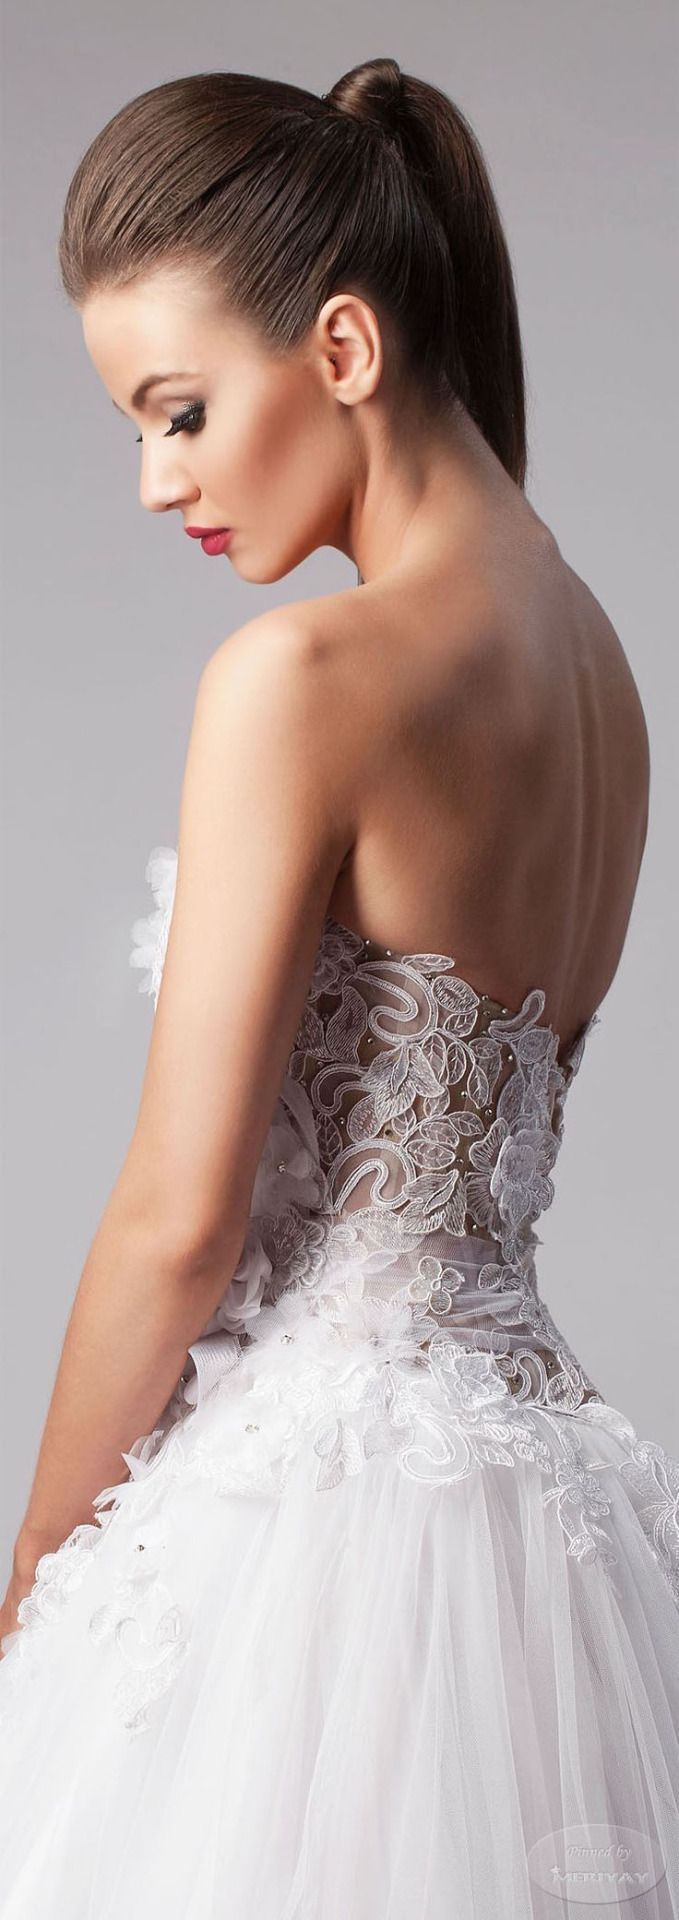 Belles wedding dress   best The Princess  Parlor images on Pinterest  Bridal